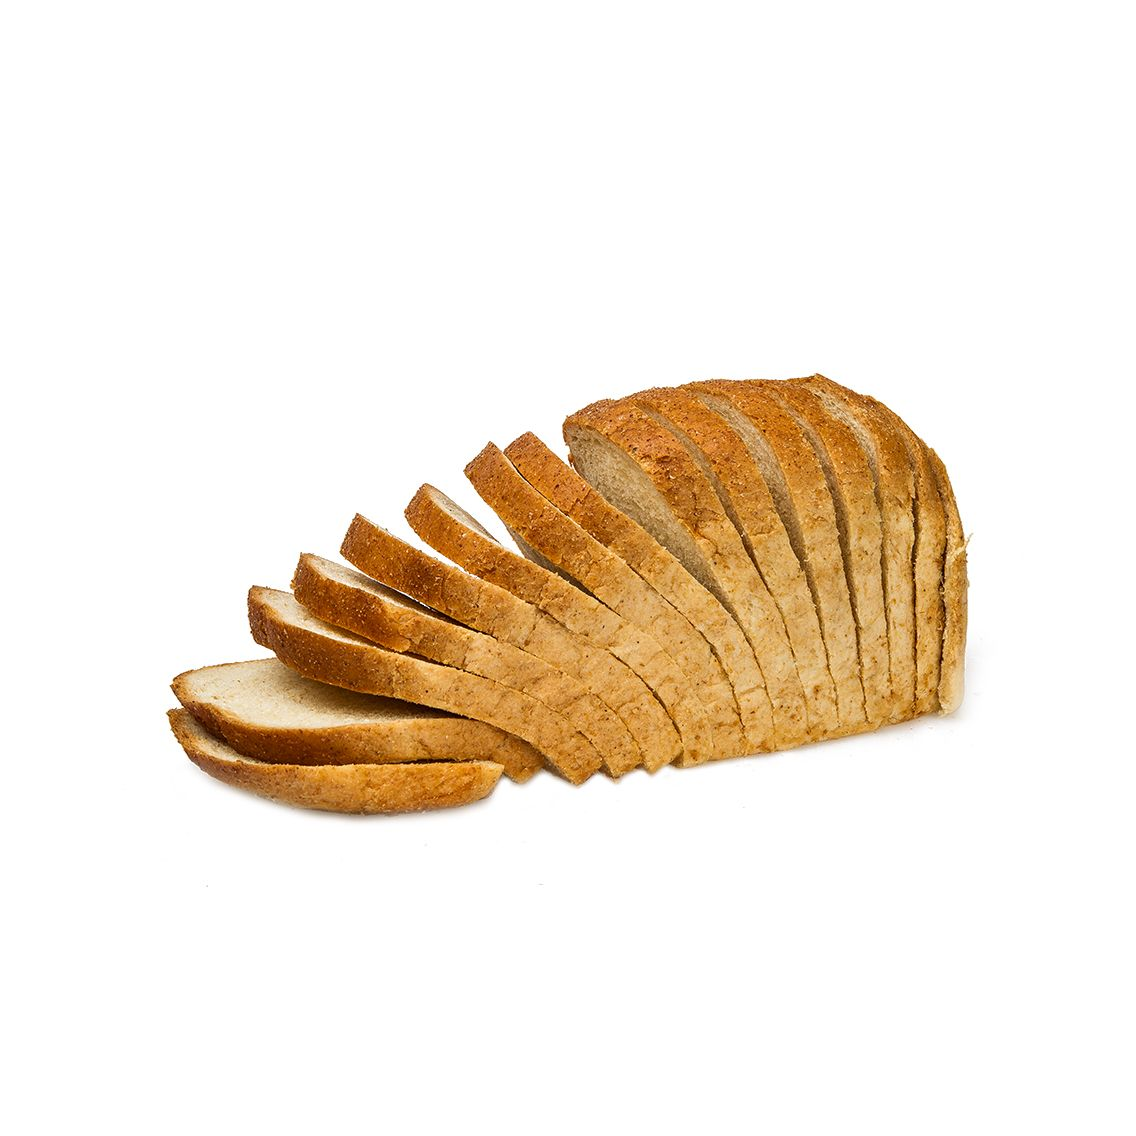 Kitchen Cuisine Default Category Bran Bread